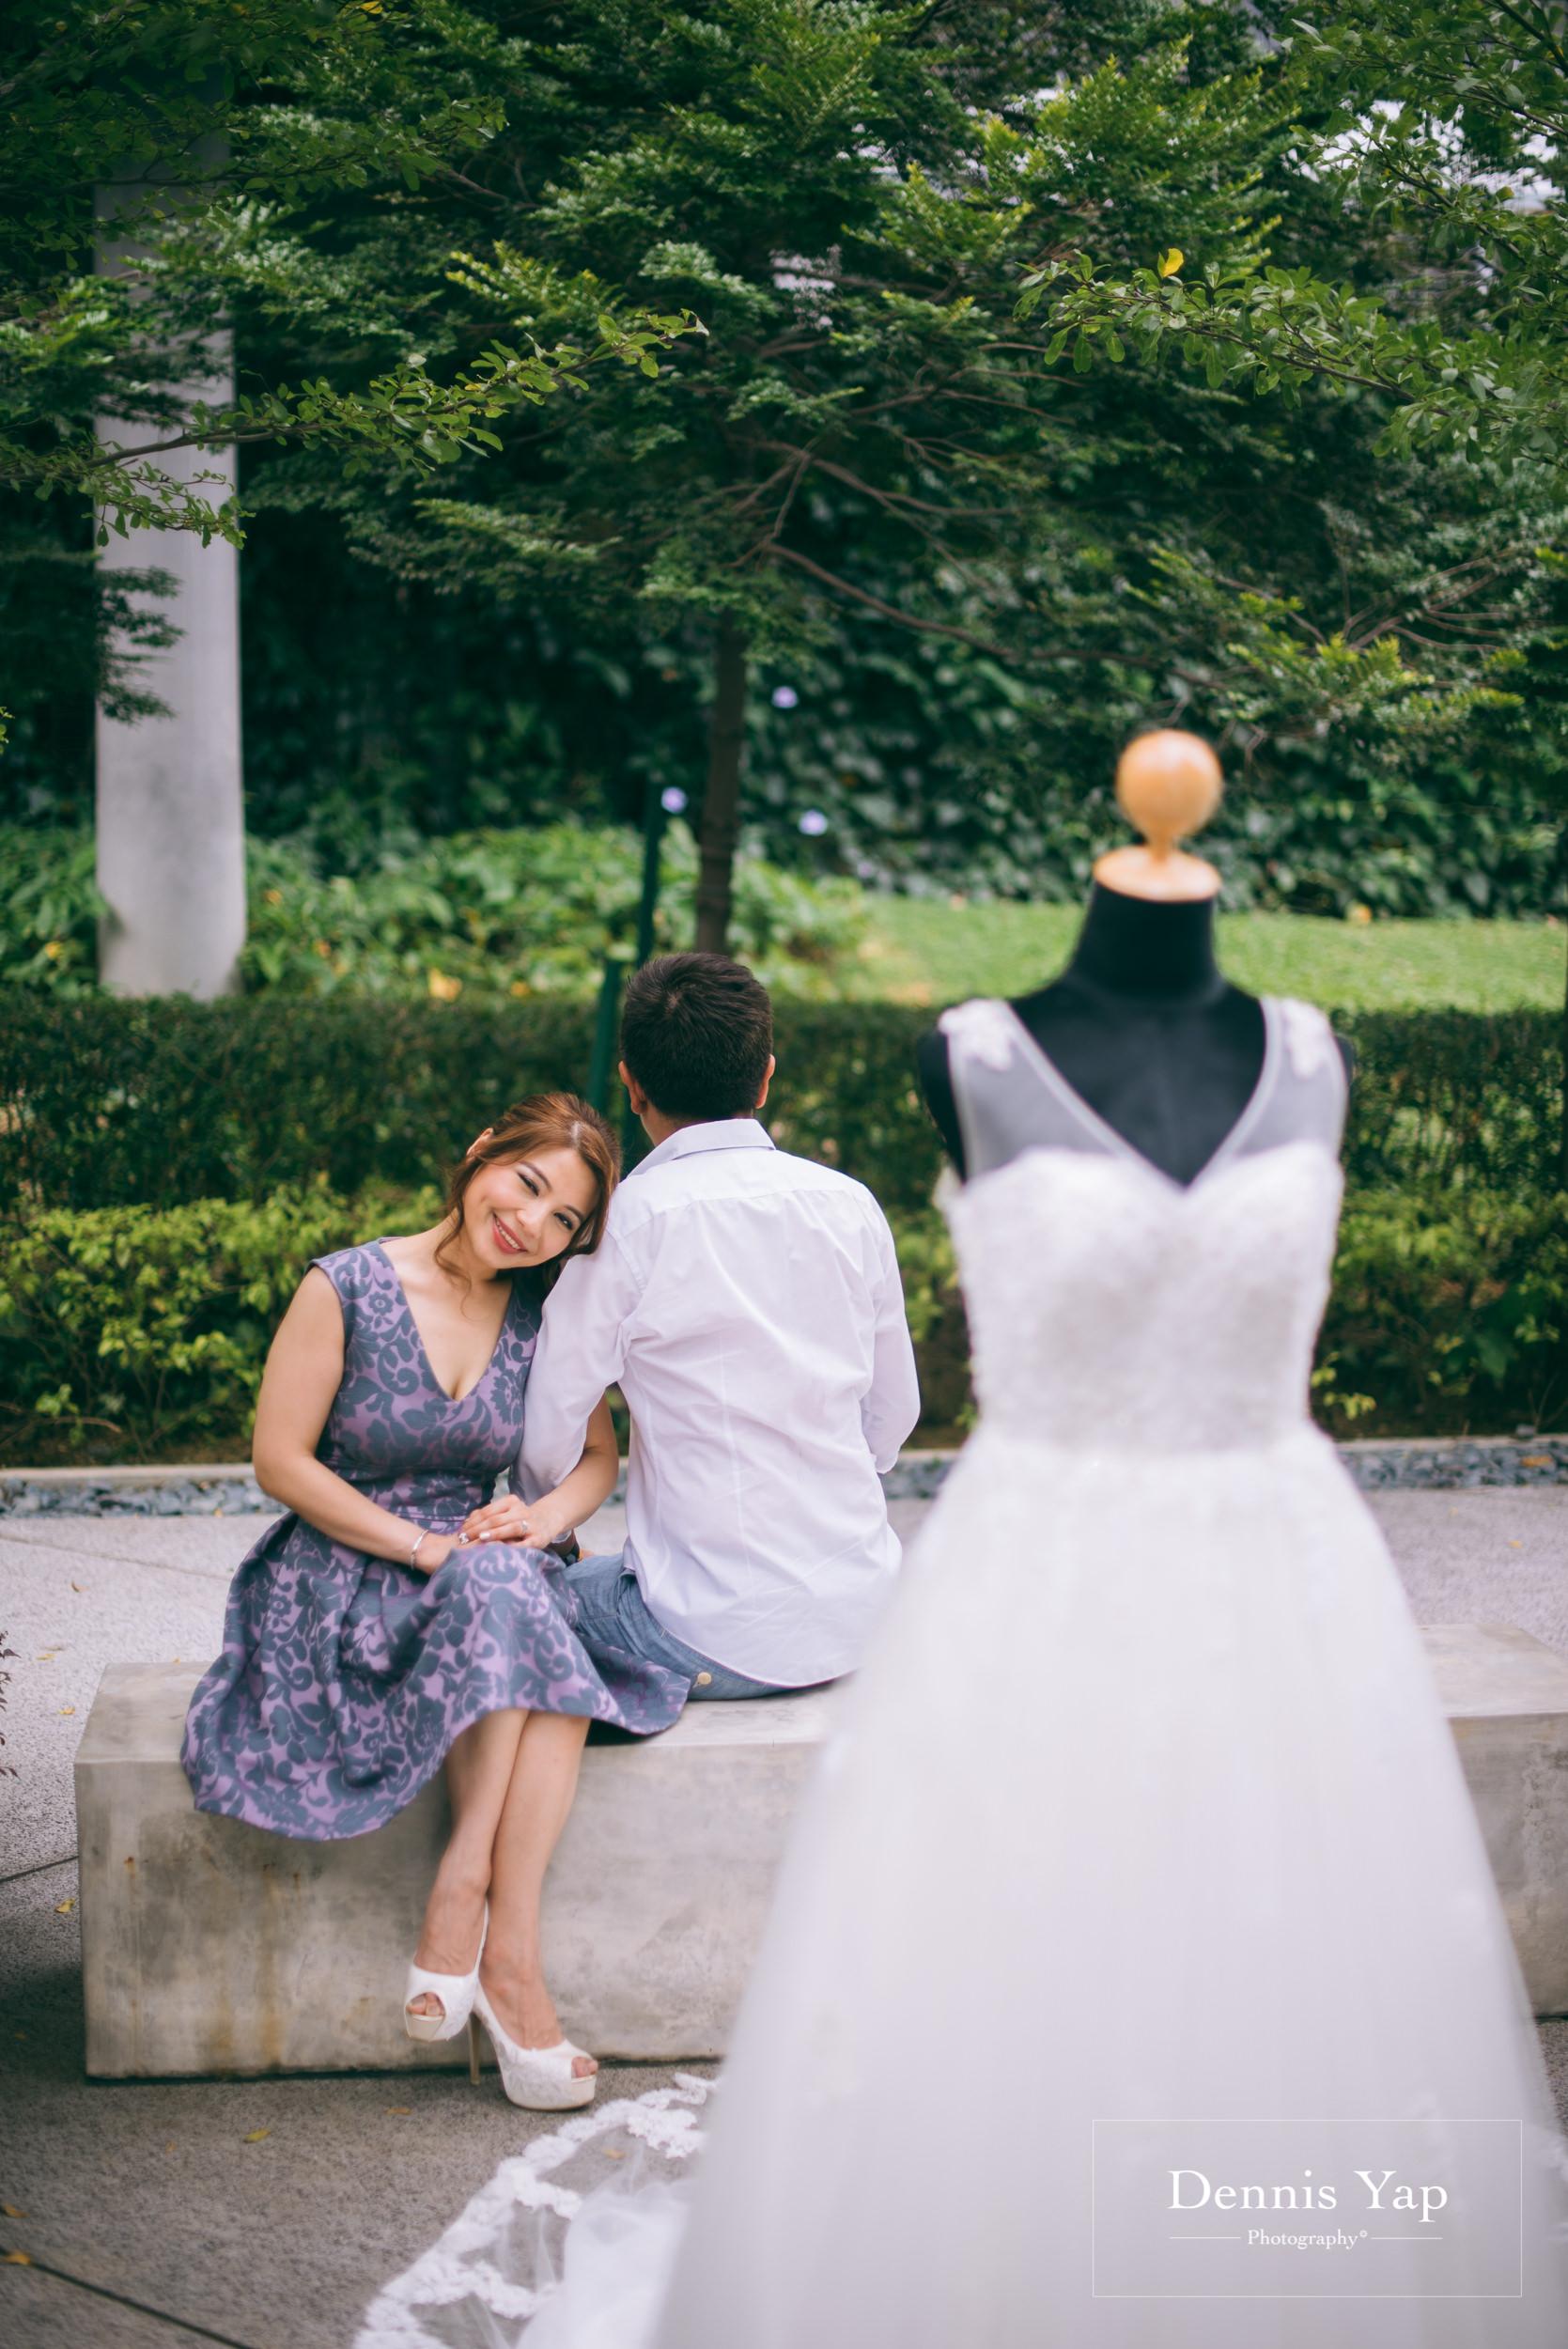 pung doris pre wedding desa park dennis yap photography-29.jpg